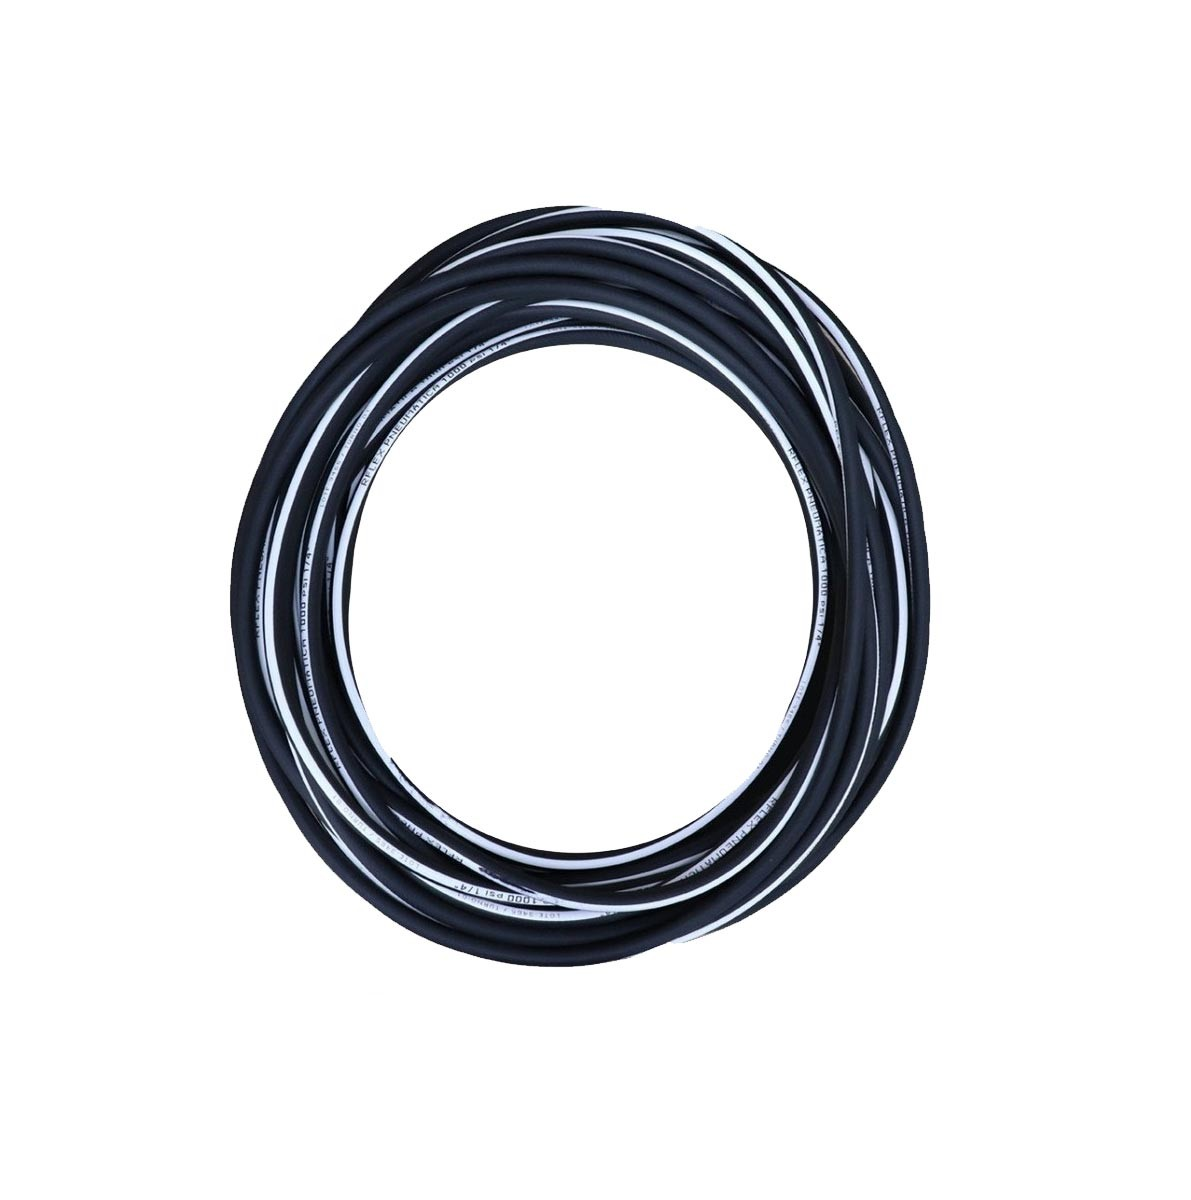 Mangueira de Ar P/ Compressor 5/16 Preta Faixa Branca 1000Psi 10 Metros